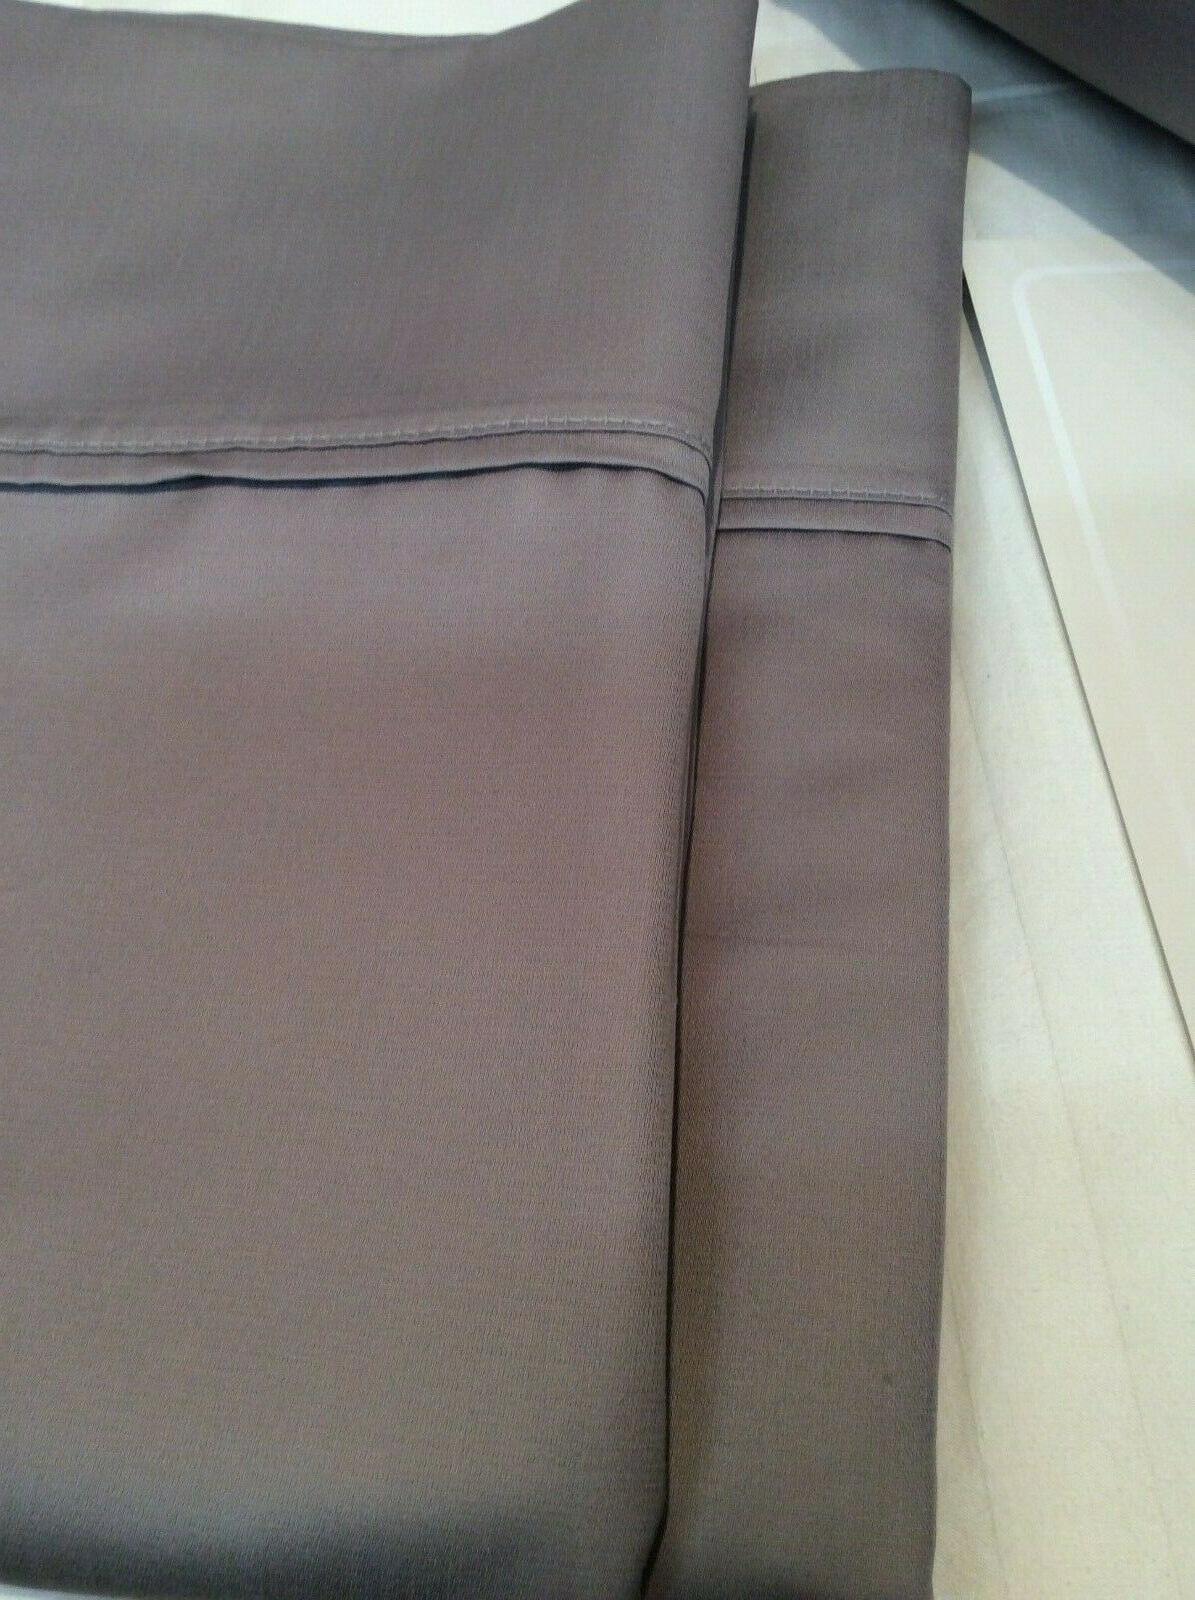 King Sheets Northern Cotton Gray